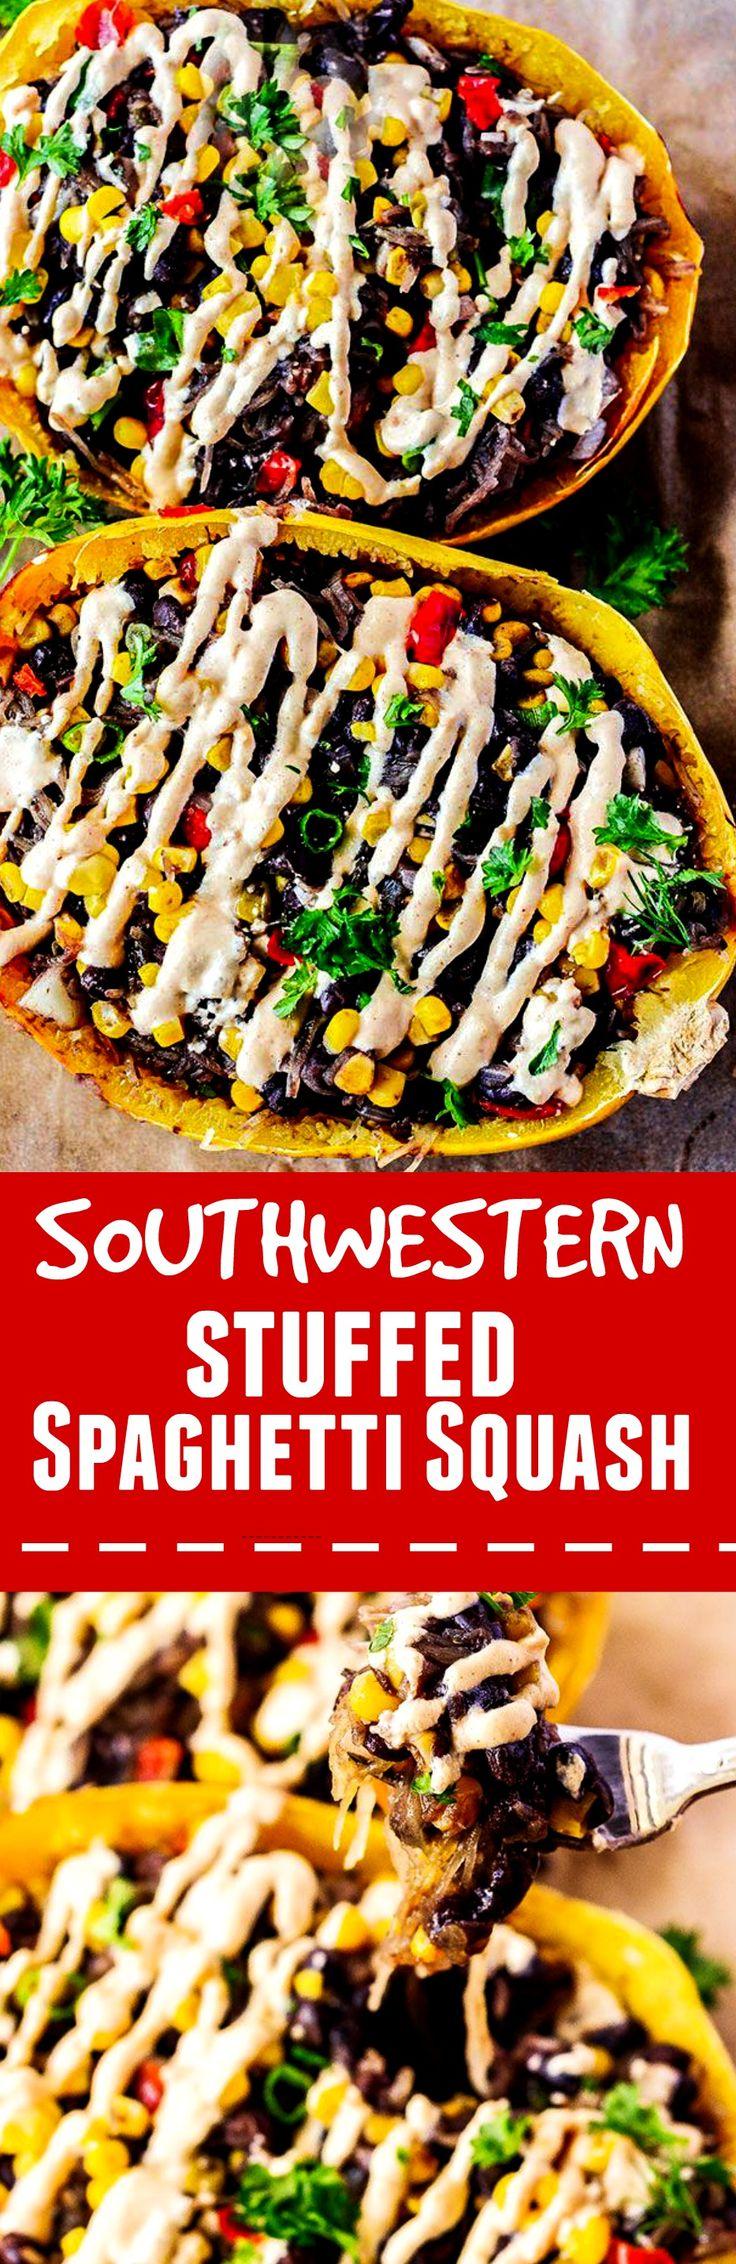 Southwestern Stuffed Spaghetti Squash #vegan gluten free recipes #spaghettisquash #texmexrecipes